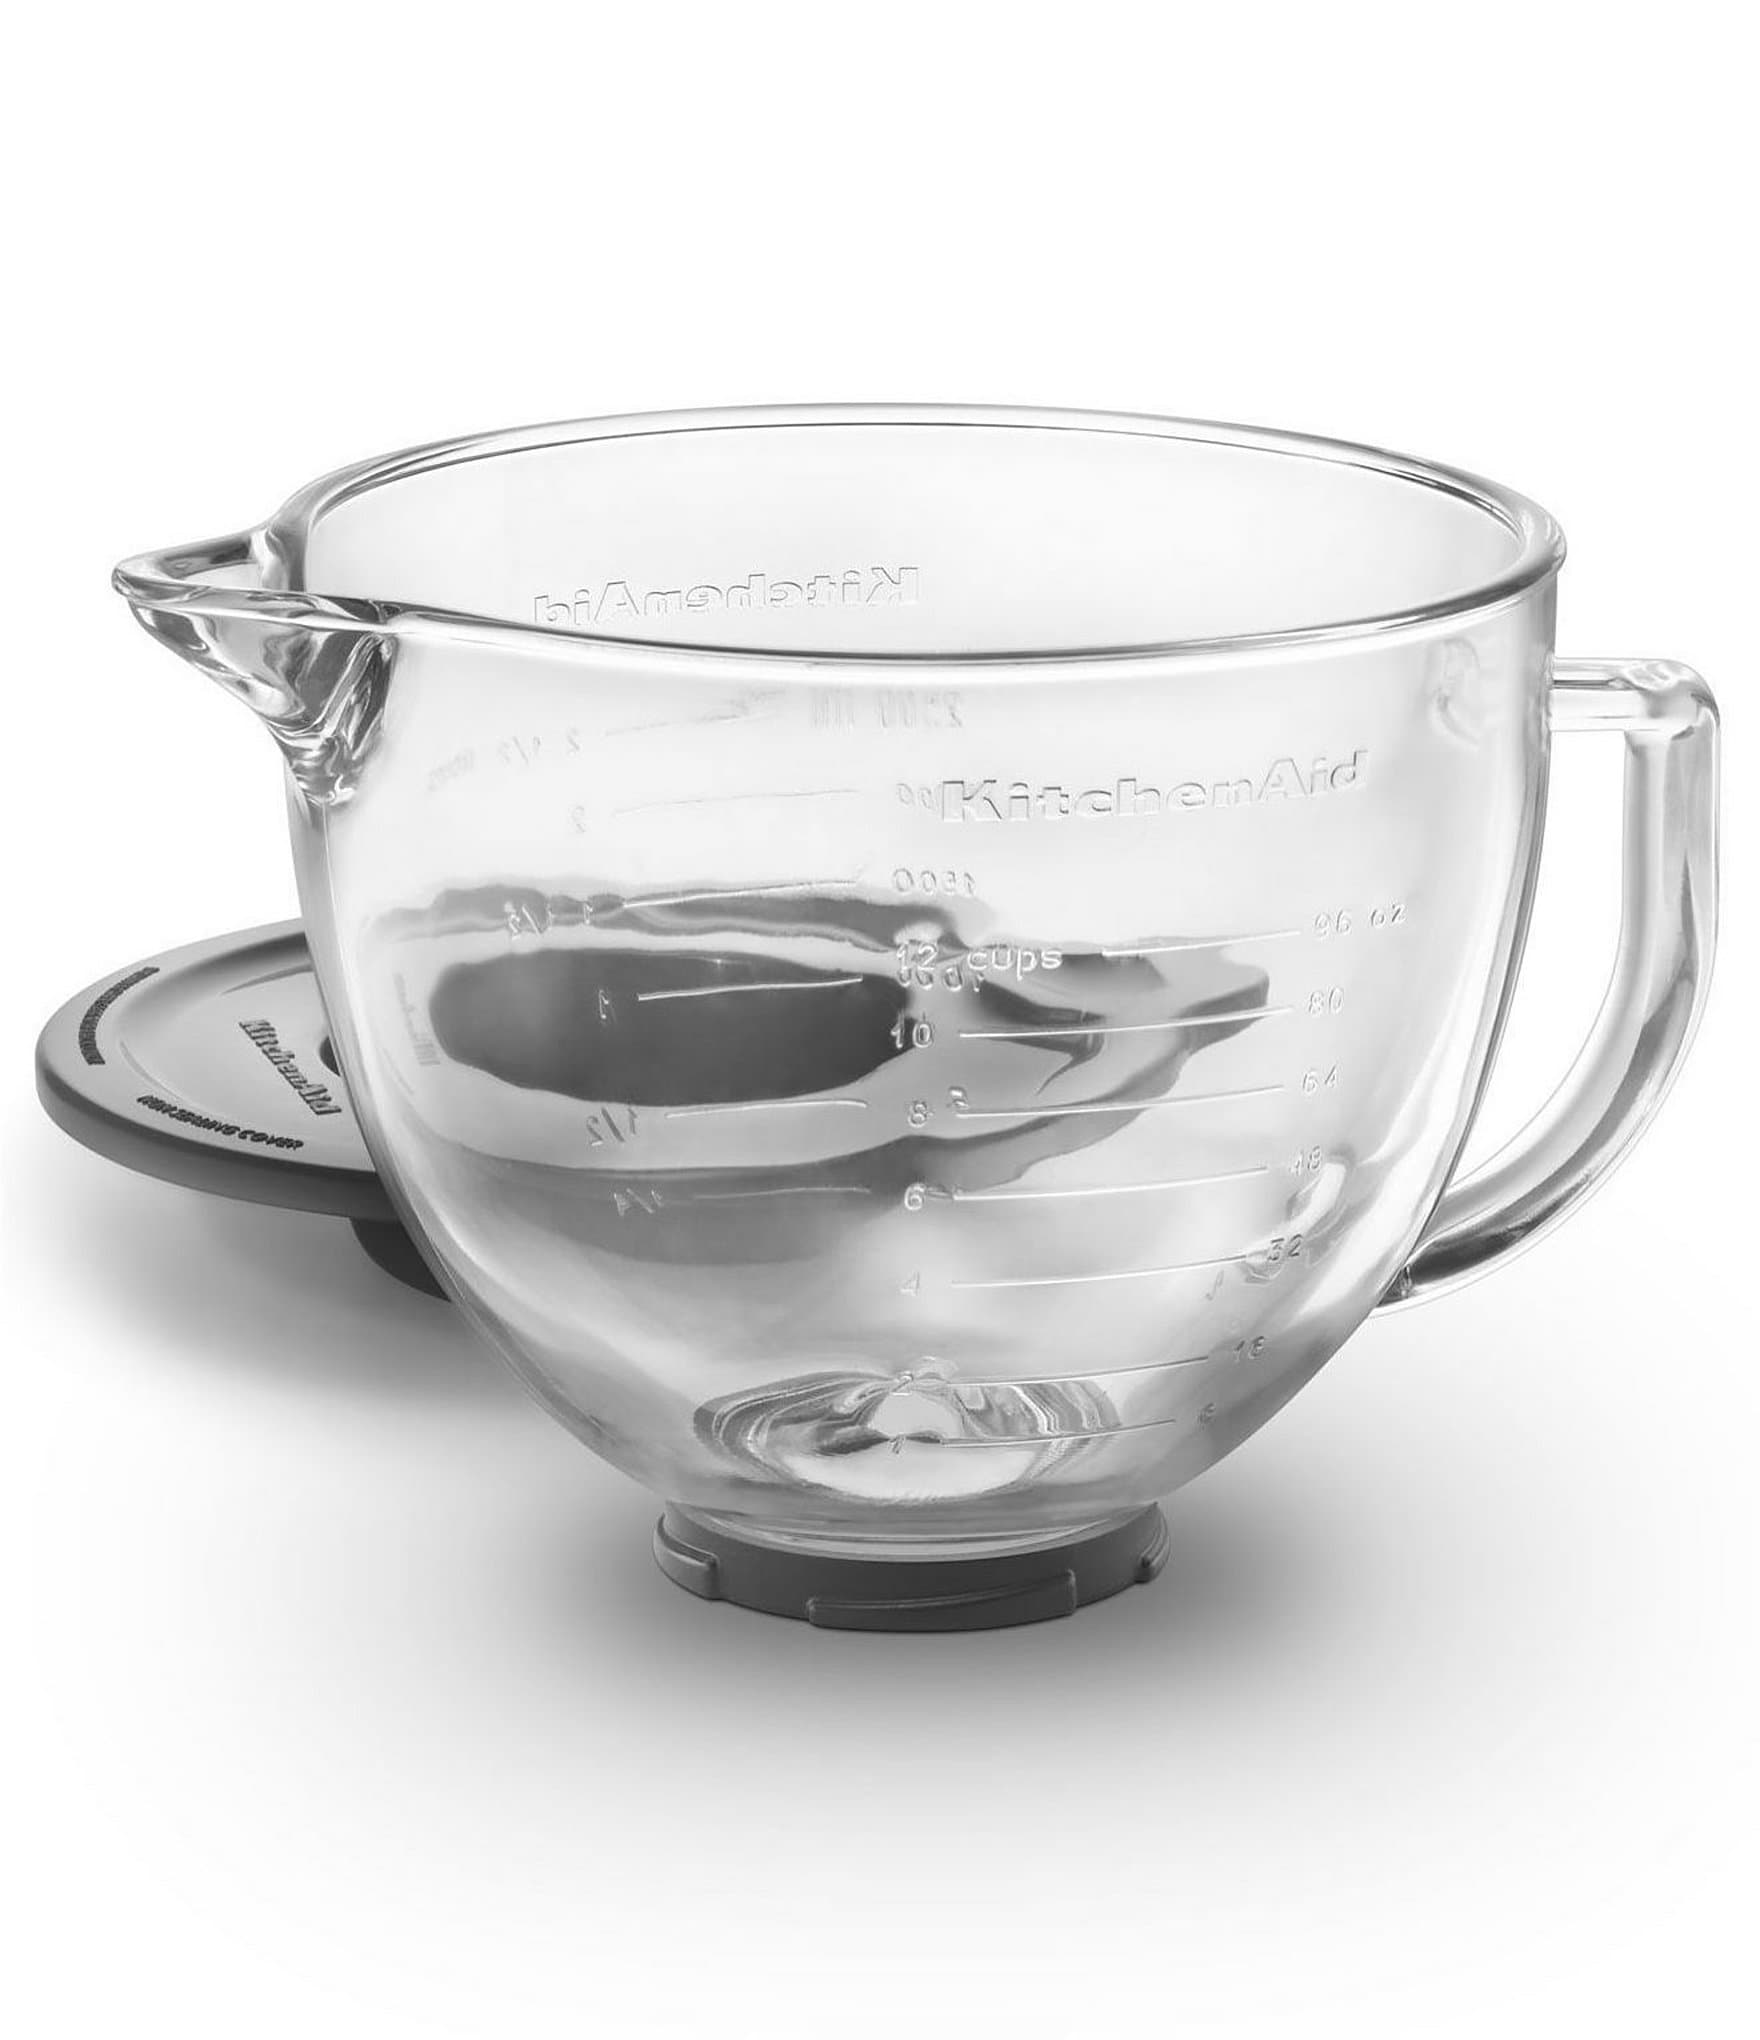 Kitchenaid 5 Quart Glass Bowl Tilt Head Stand Mixer